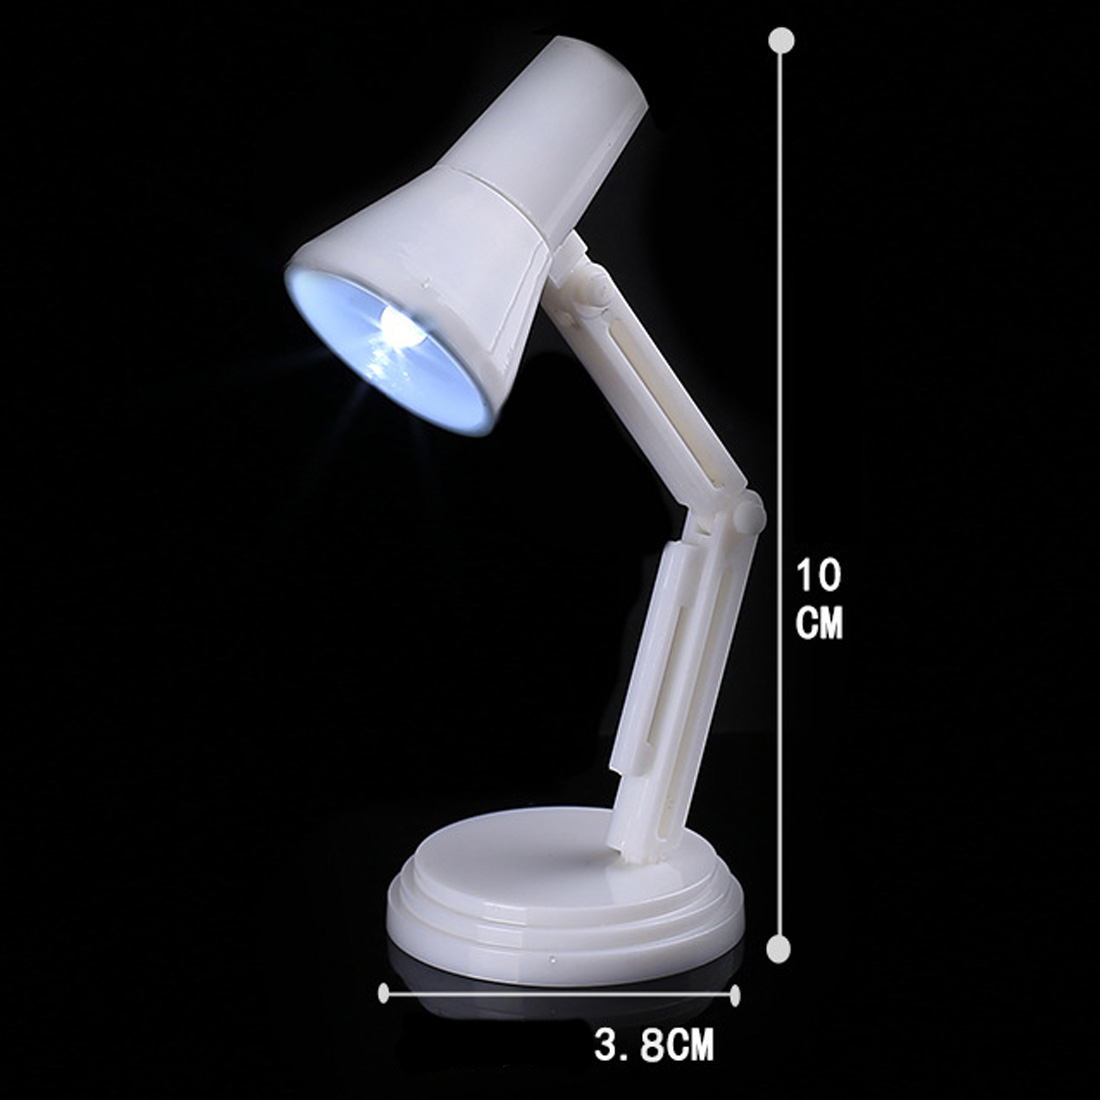 4.5V Mini Folding LED Desk Lamps Book Reading Light Portable Book Lights for Night Study Readers